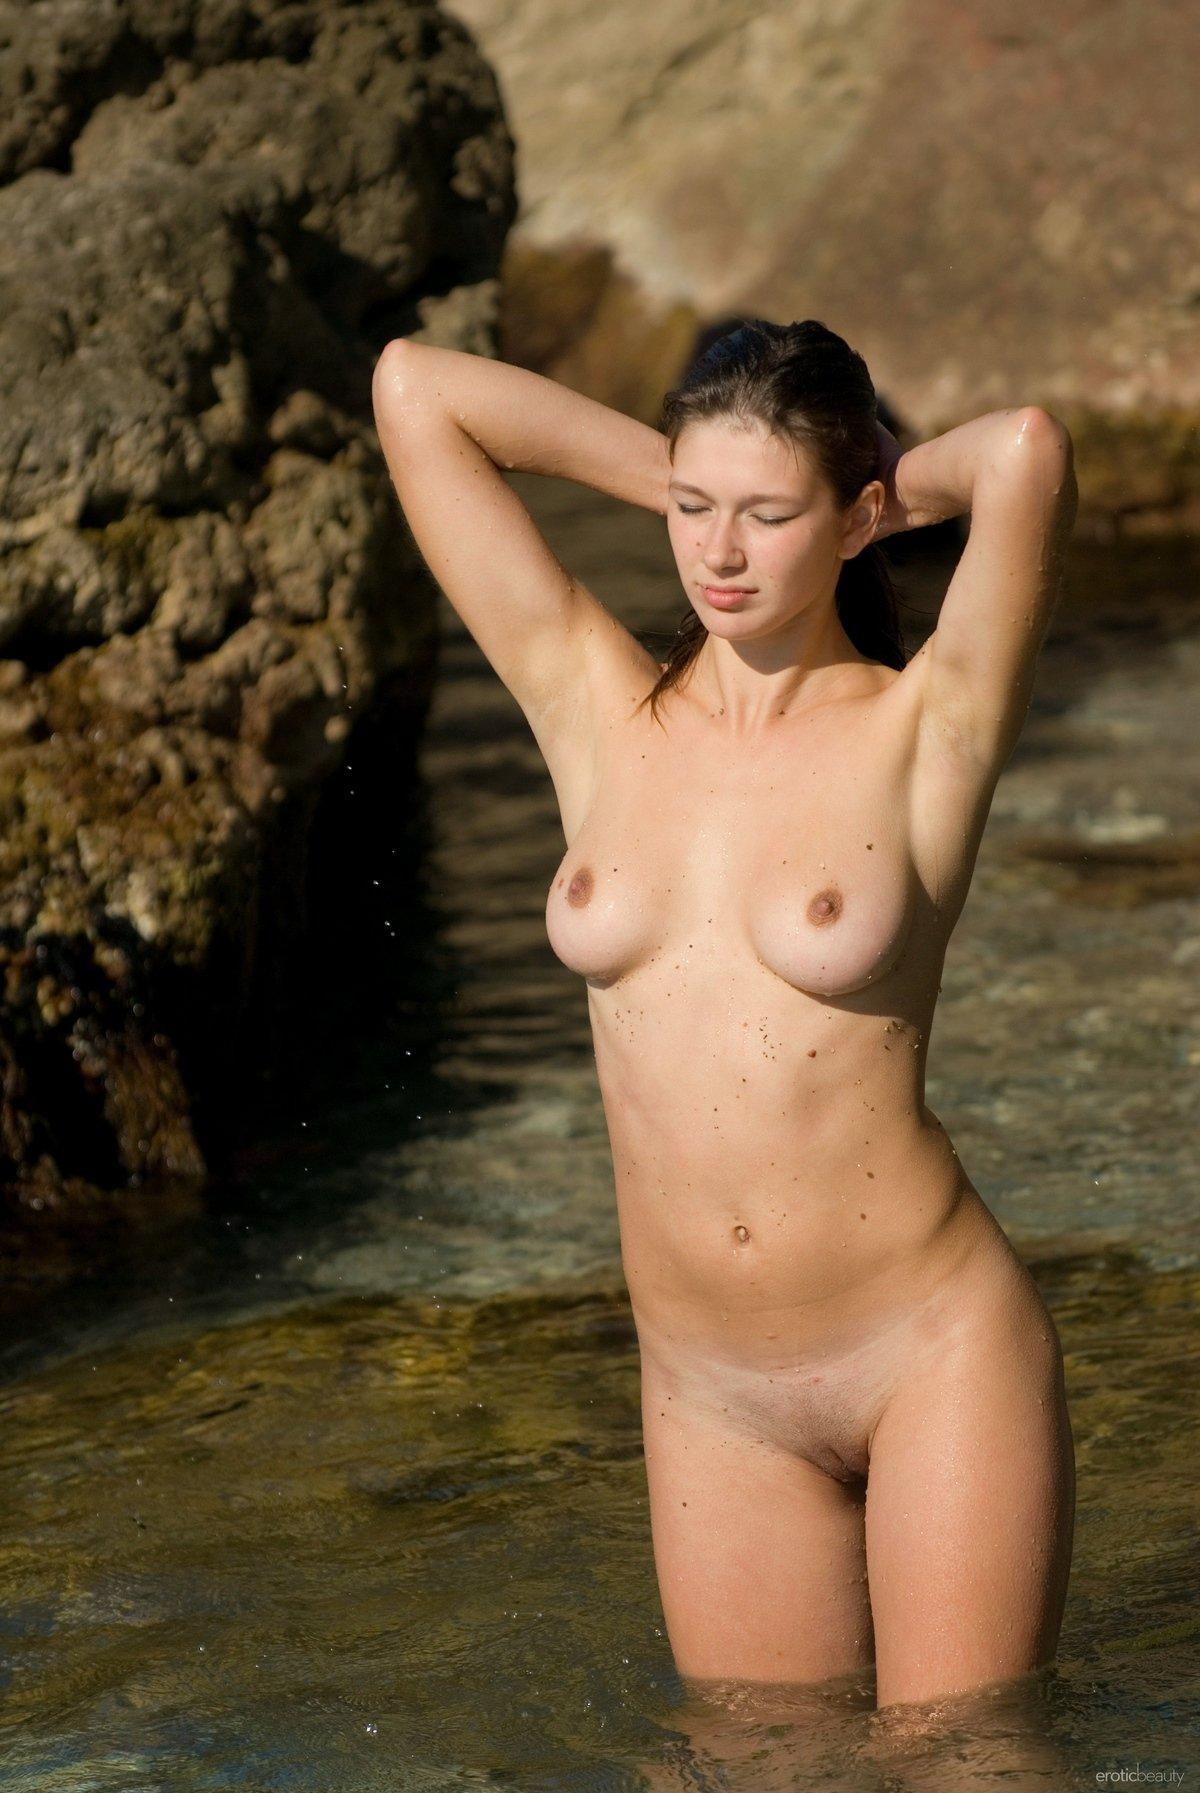 Фото ню голой девушки в море